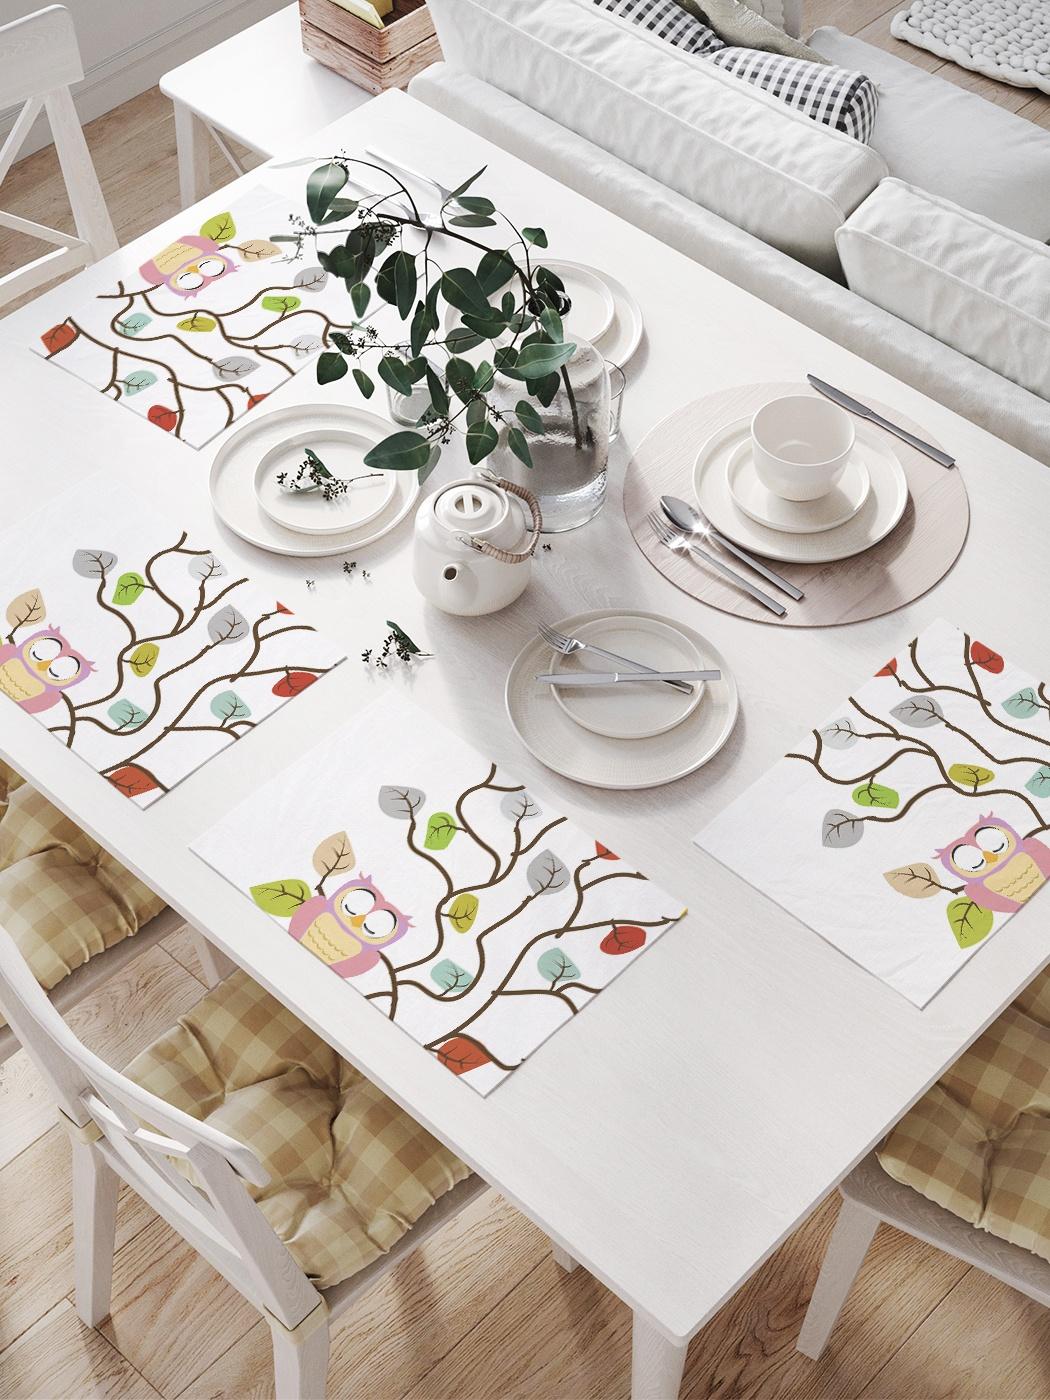 Комплект салфеток для сервировки стола «Сова в мечтах» (32х46 см, 4 шт.)